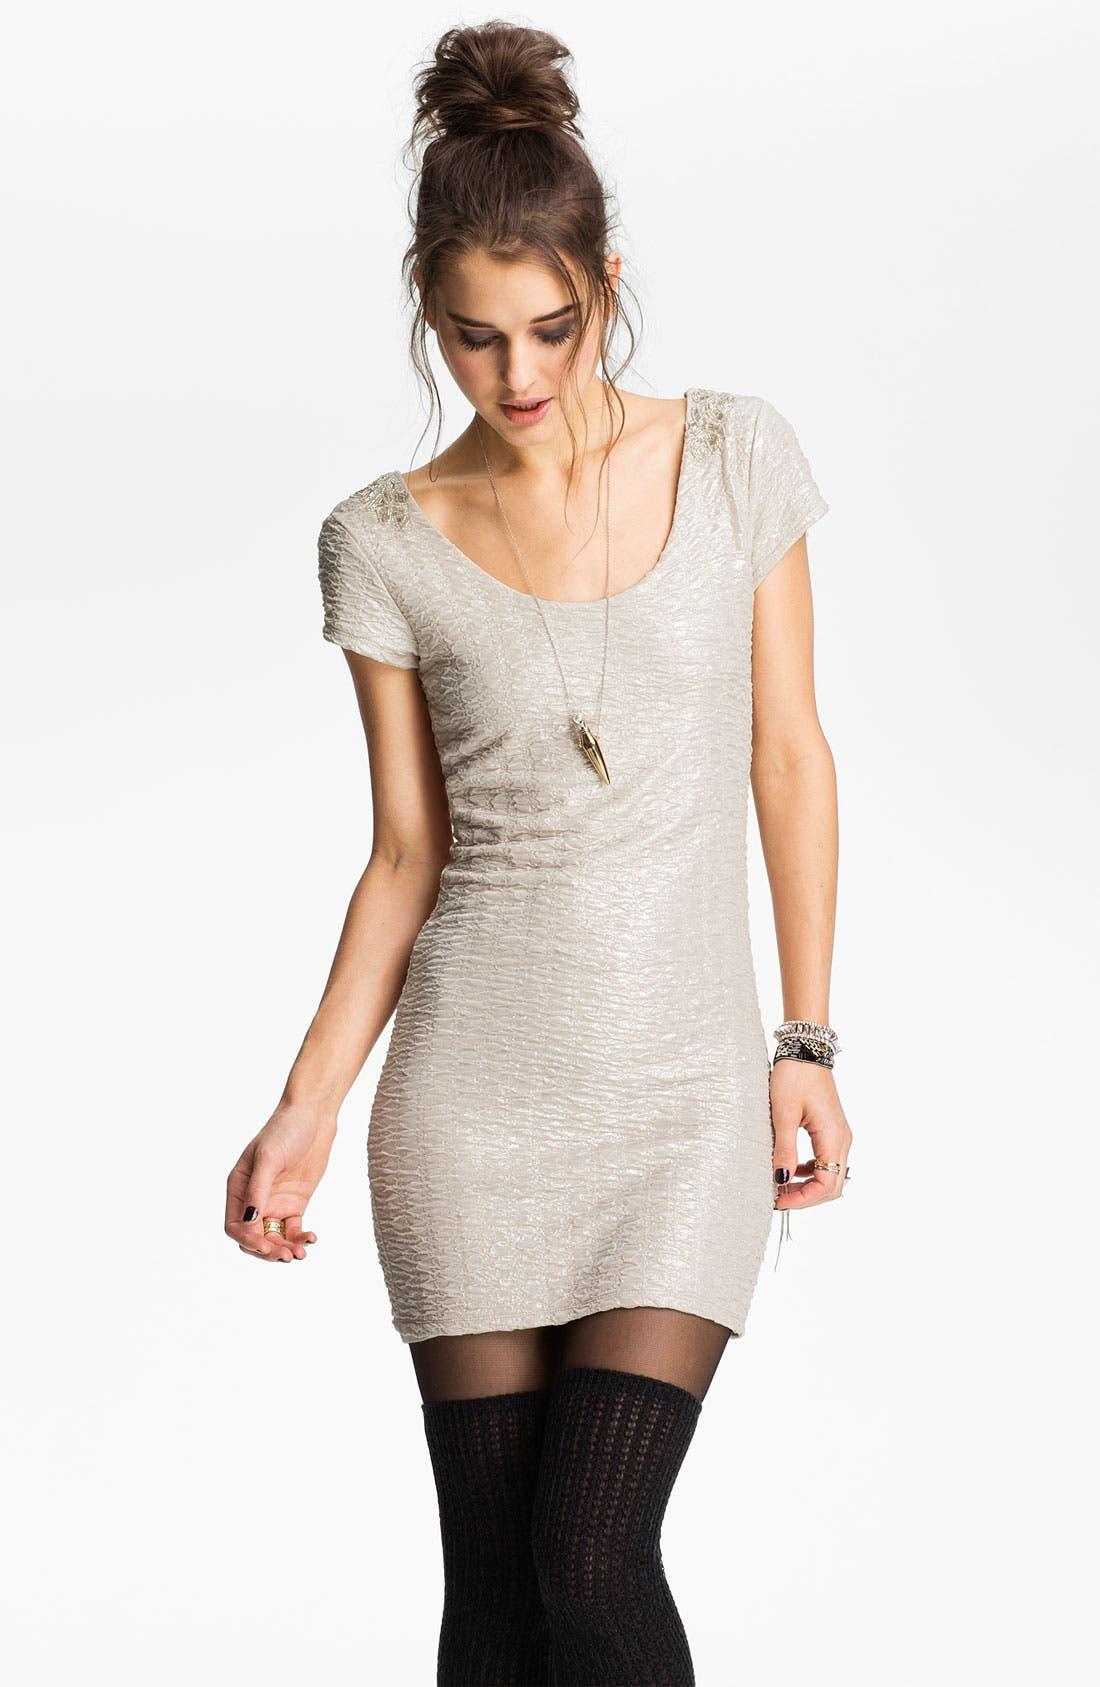 Alternate Image 1 Selected - Free People Embellished U-Back Body-Con Dress